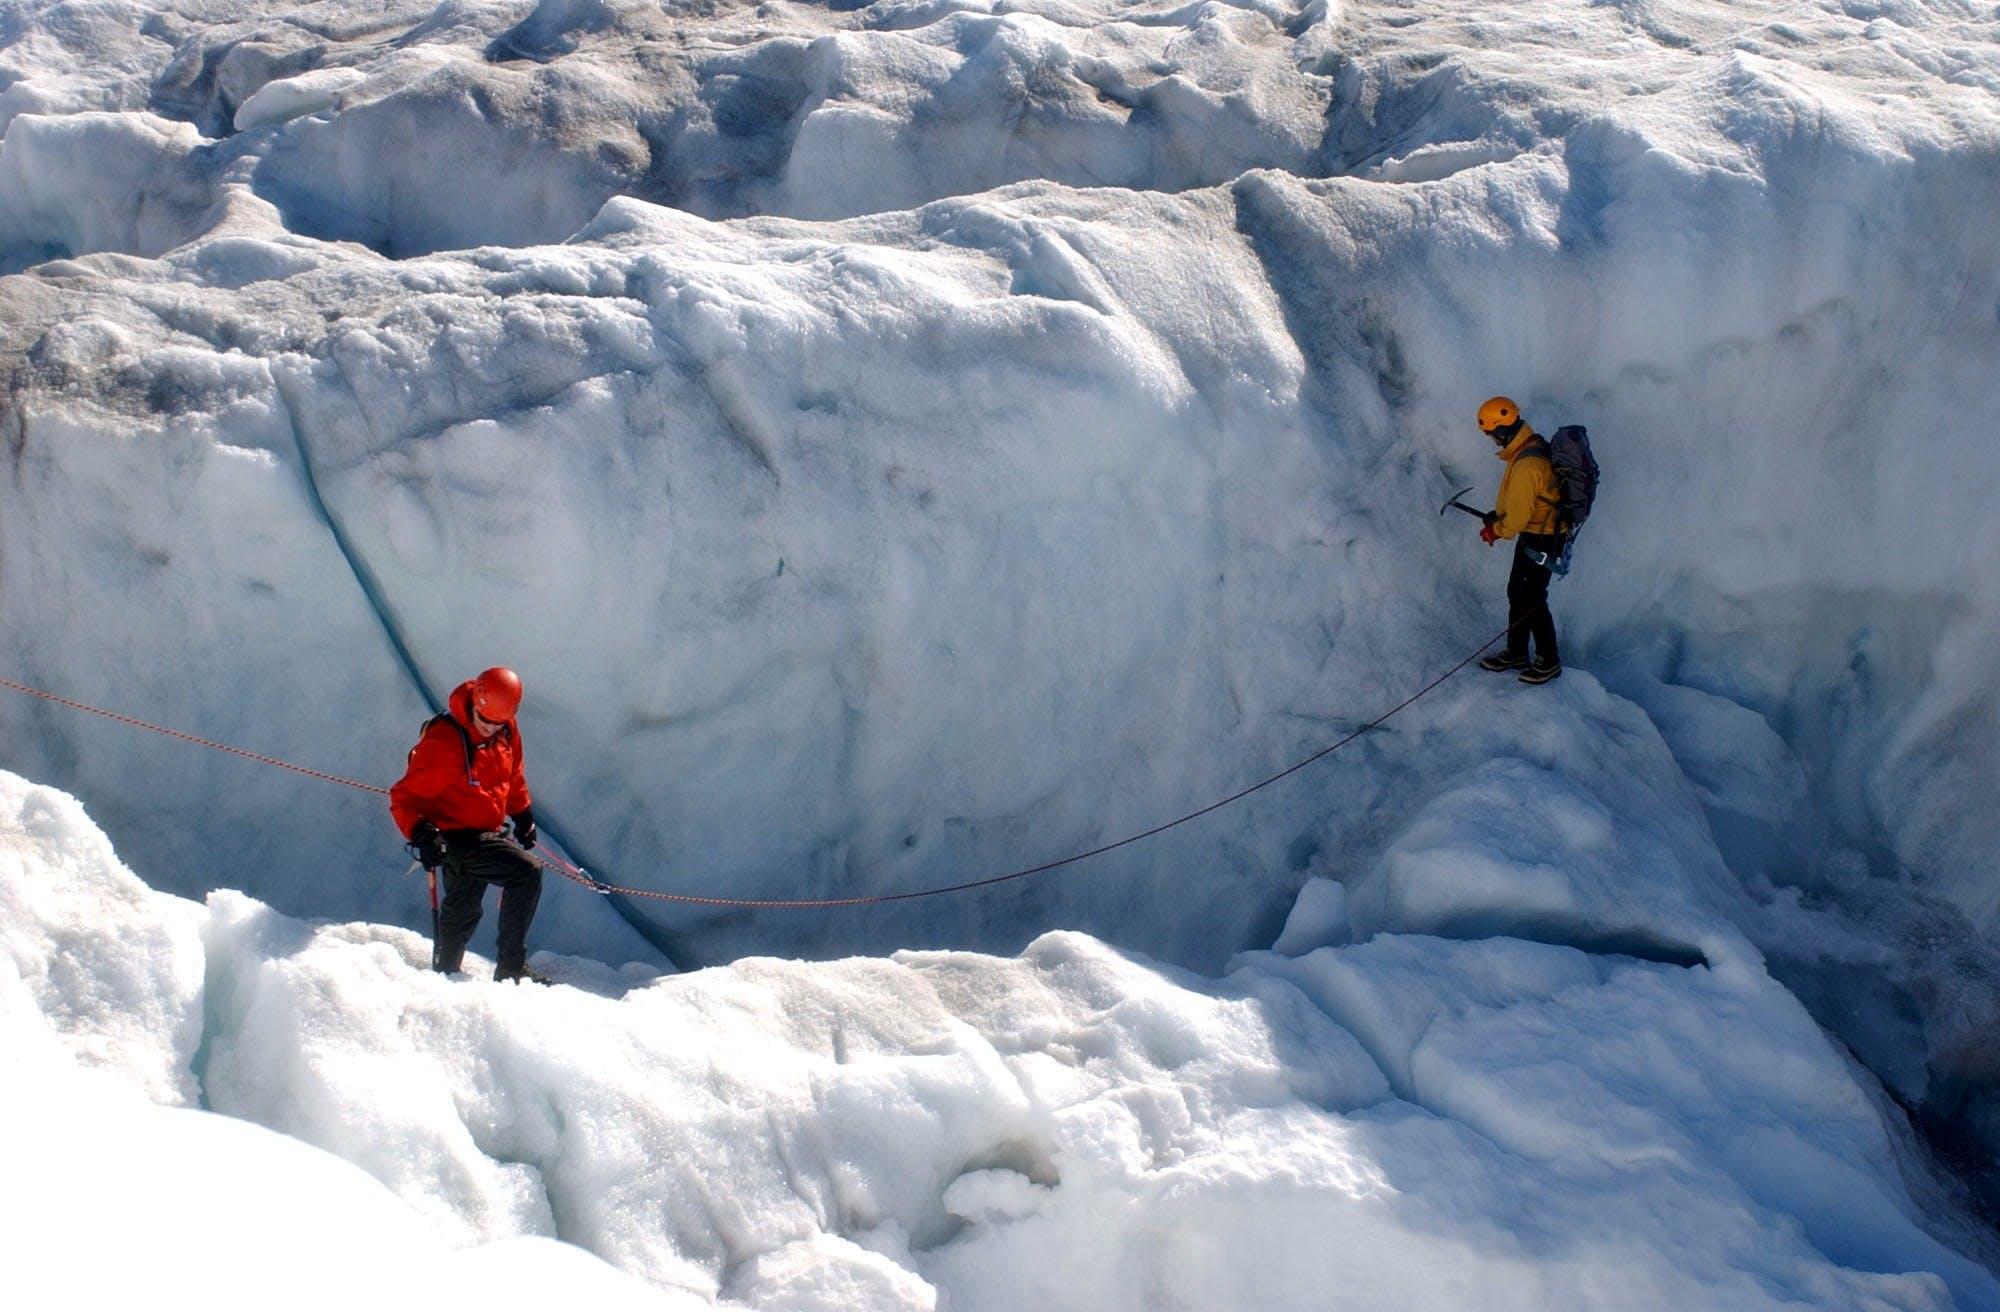 adventure, climbers, climbing